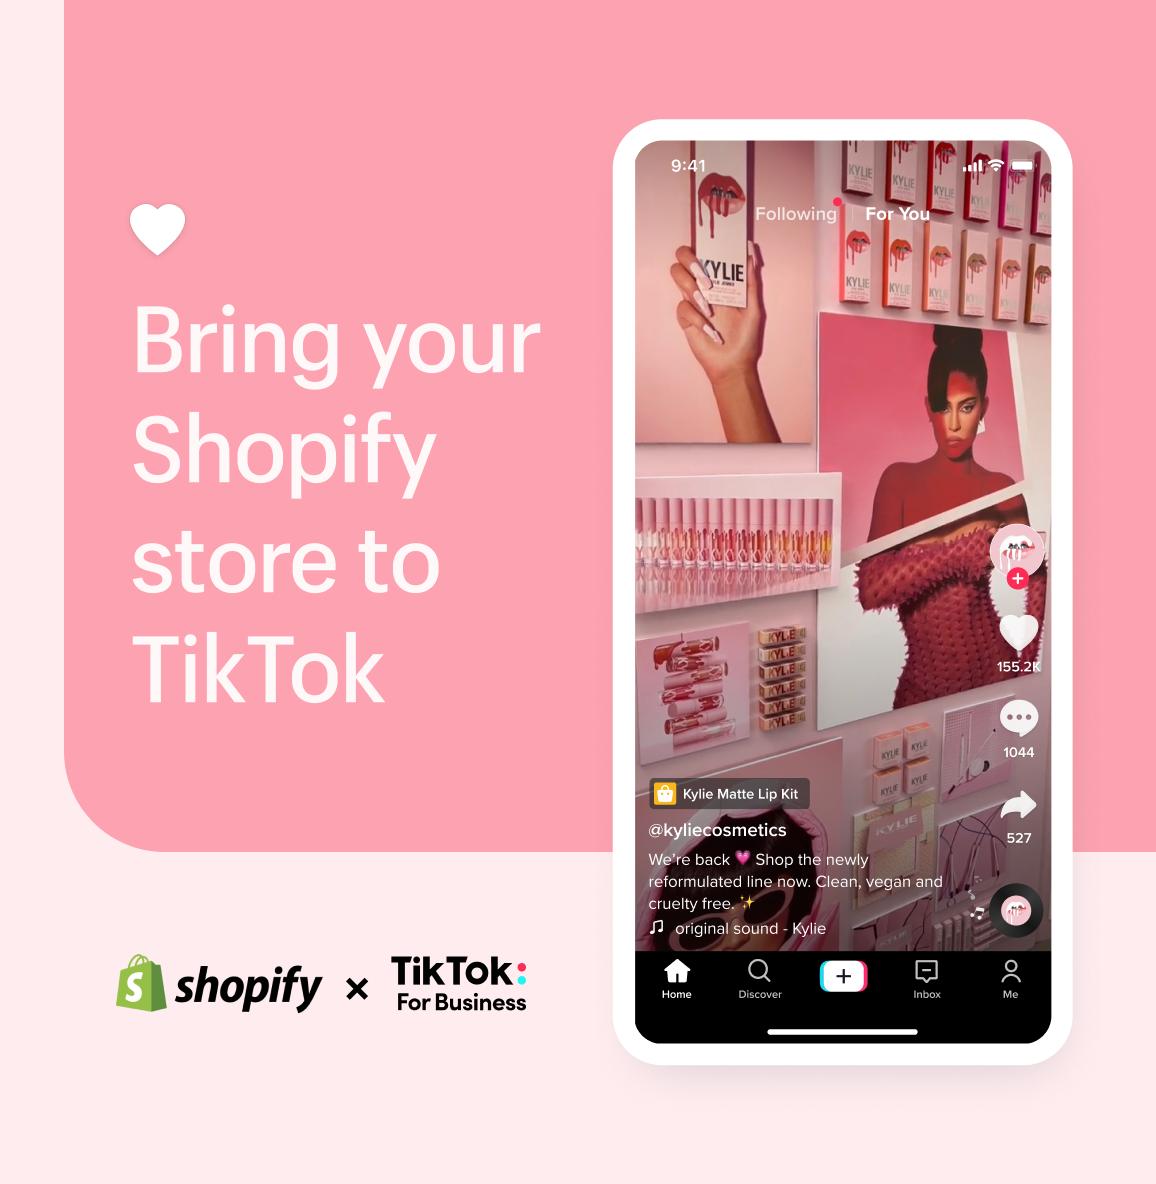 TikTok expands Shopify partnership in US, UK, & Canada